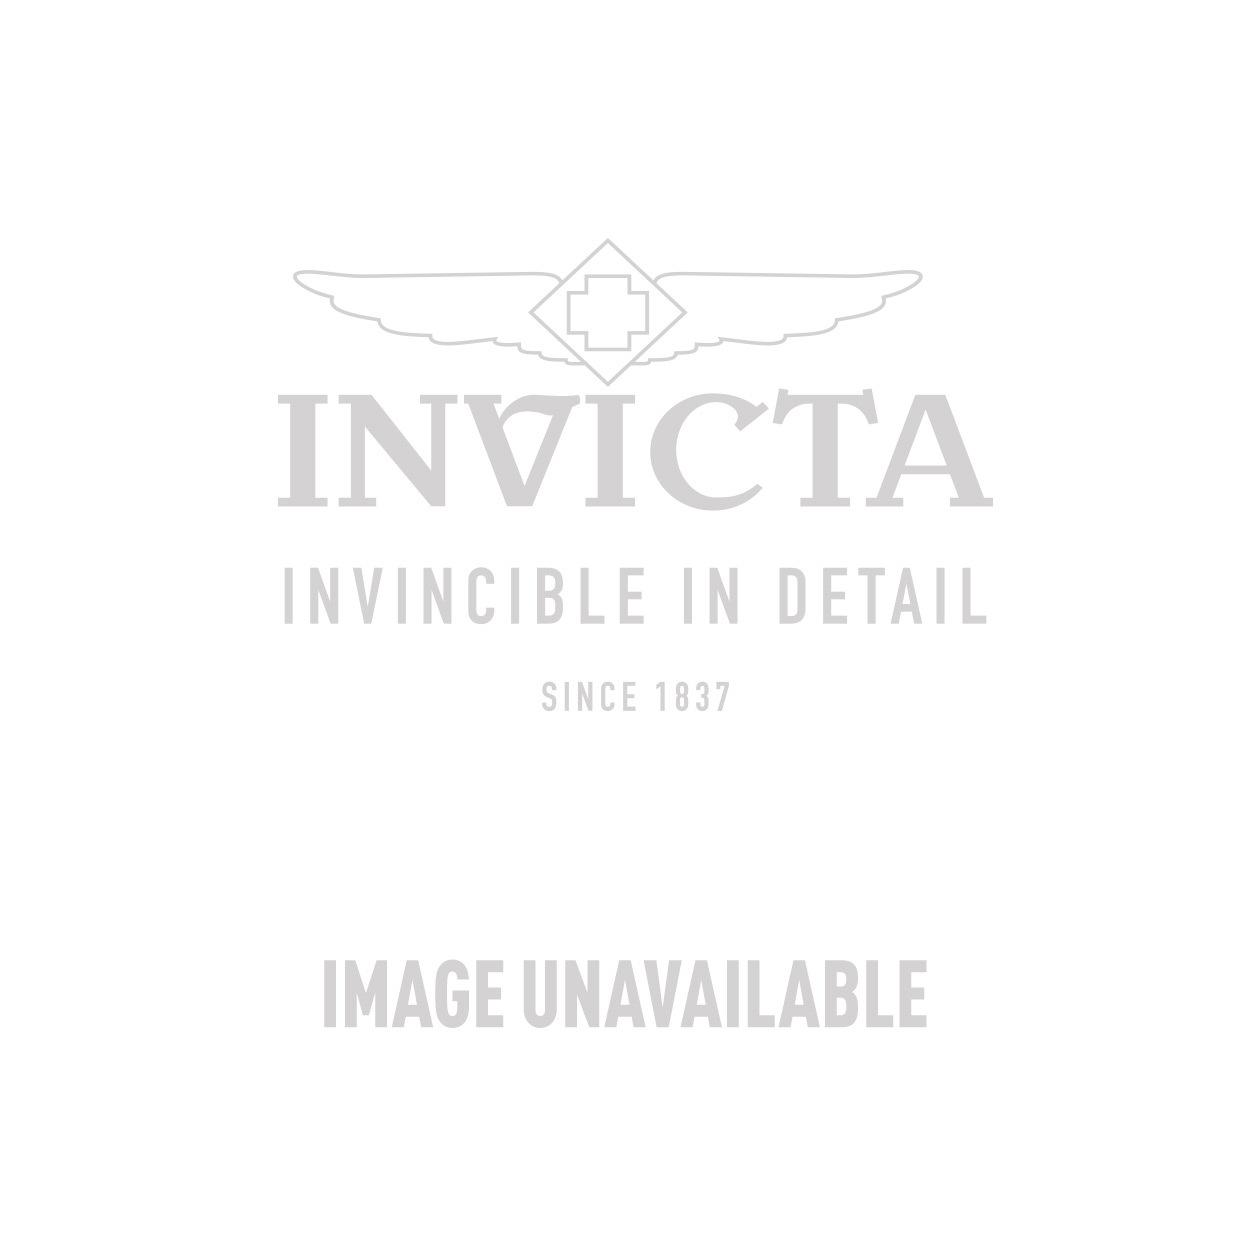 51e13d2e9 Invicta Speedway SCUBA Mens Quartz 50mm Gold Case Blue Dial - Model 25941 - Official  Invicta Store